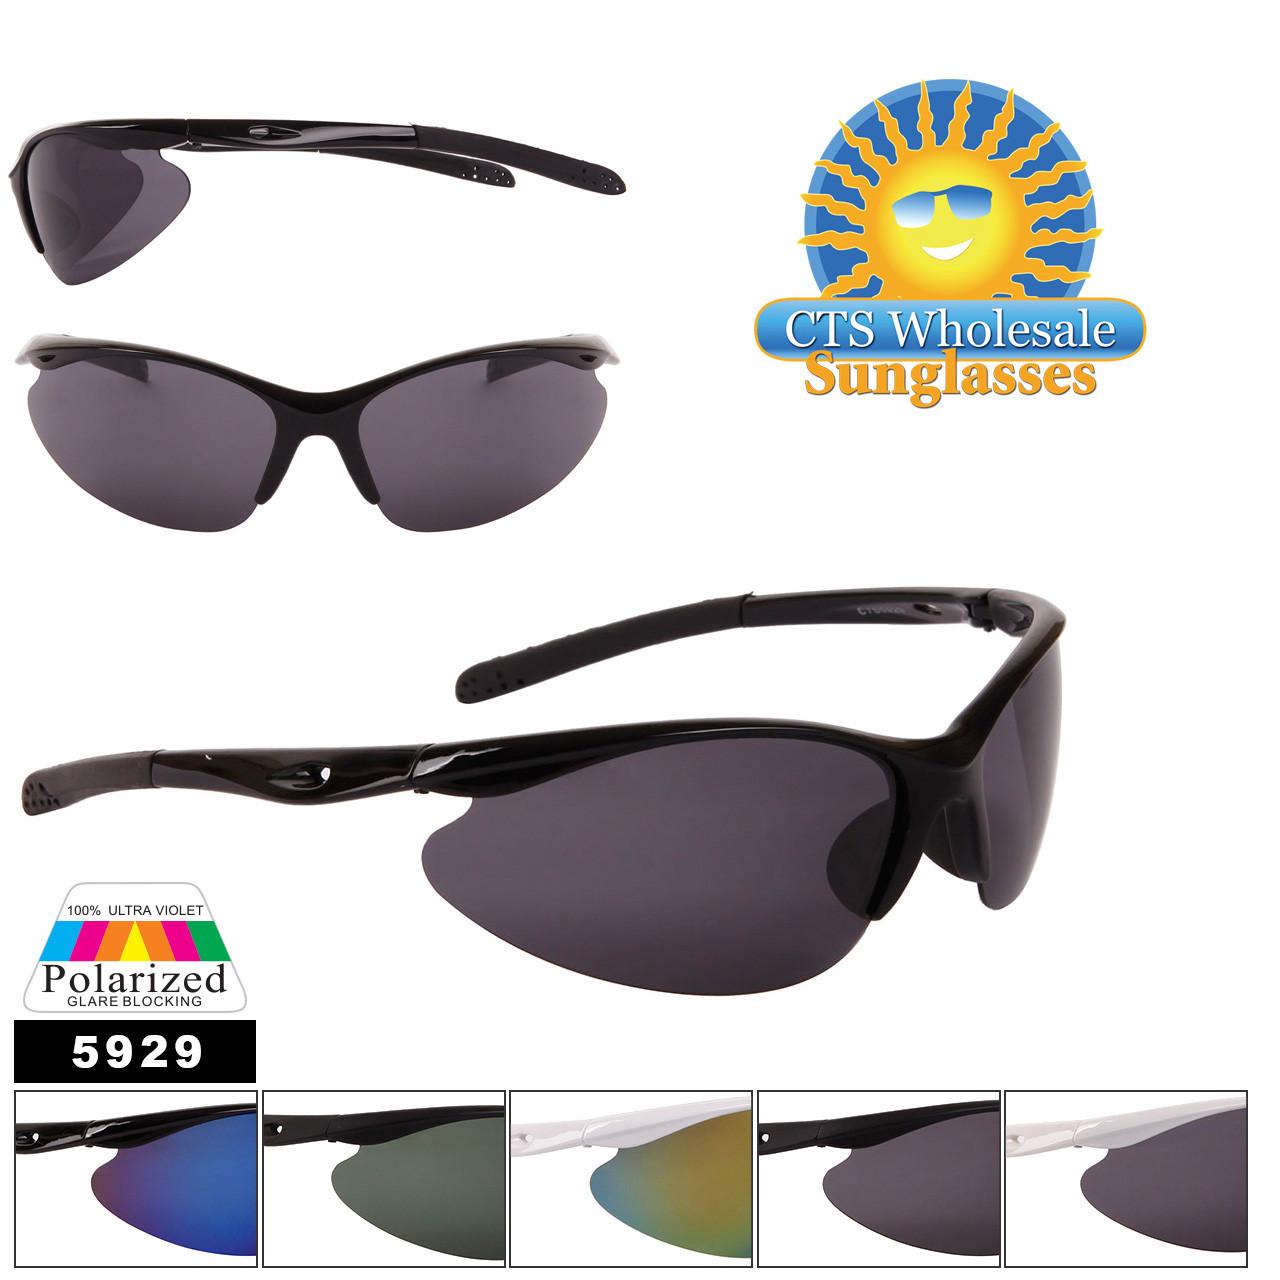 Men's Polarized Sunglasses by the Dozen - Style #5929